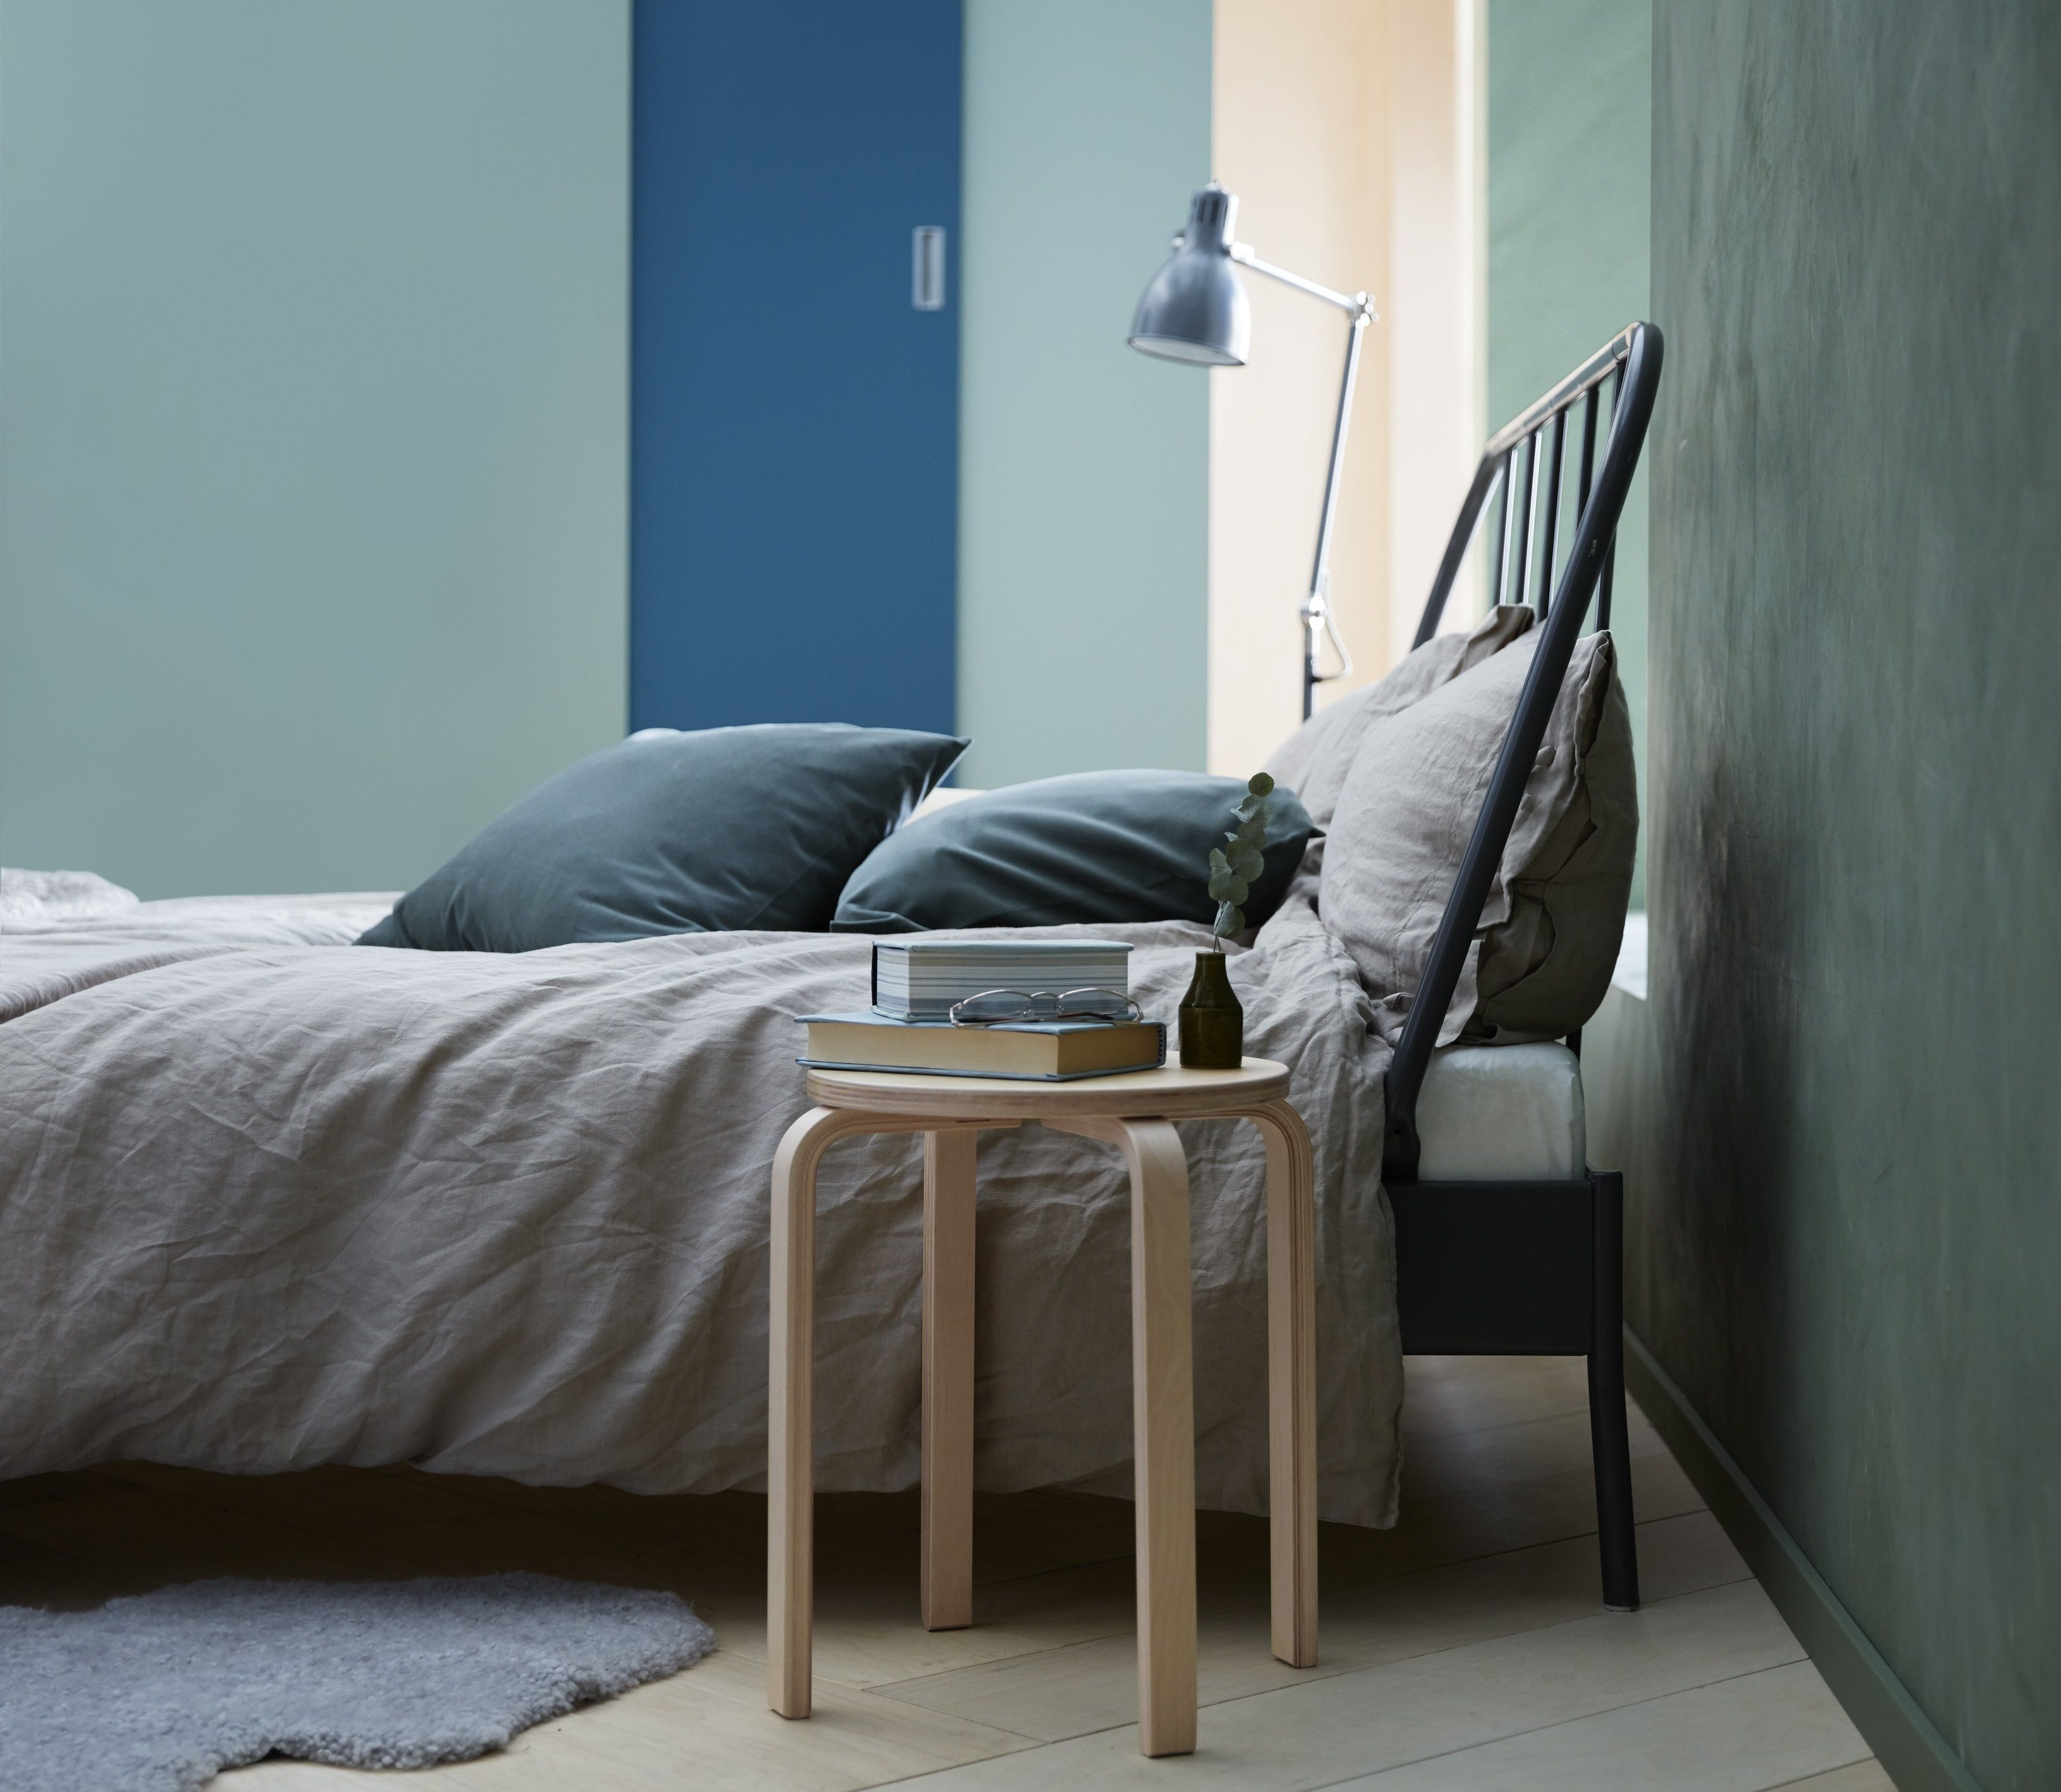 KOPARDAL Bedframe, grijs, Lönset | Slaapkamers | Pinterest ...